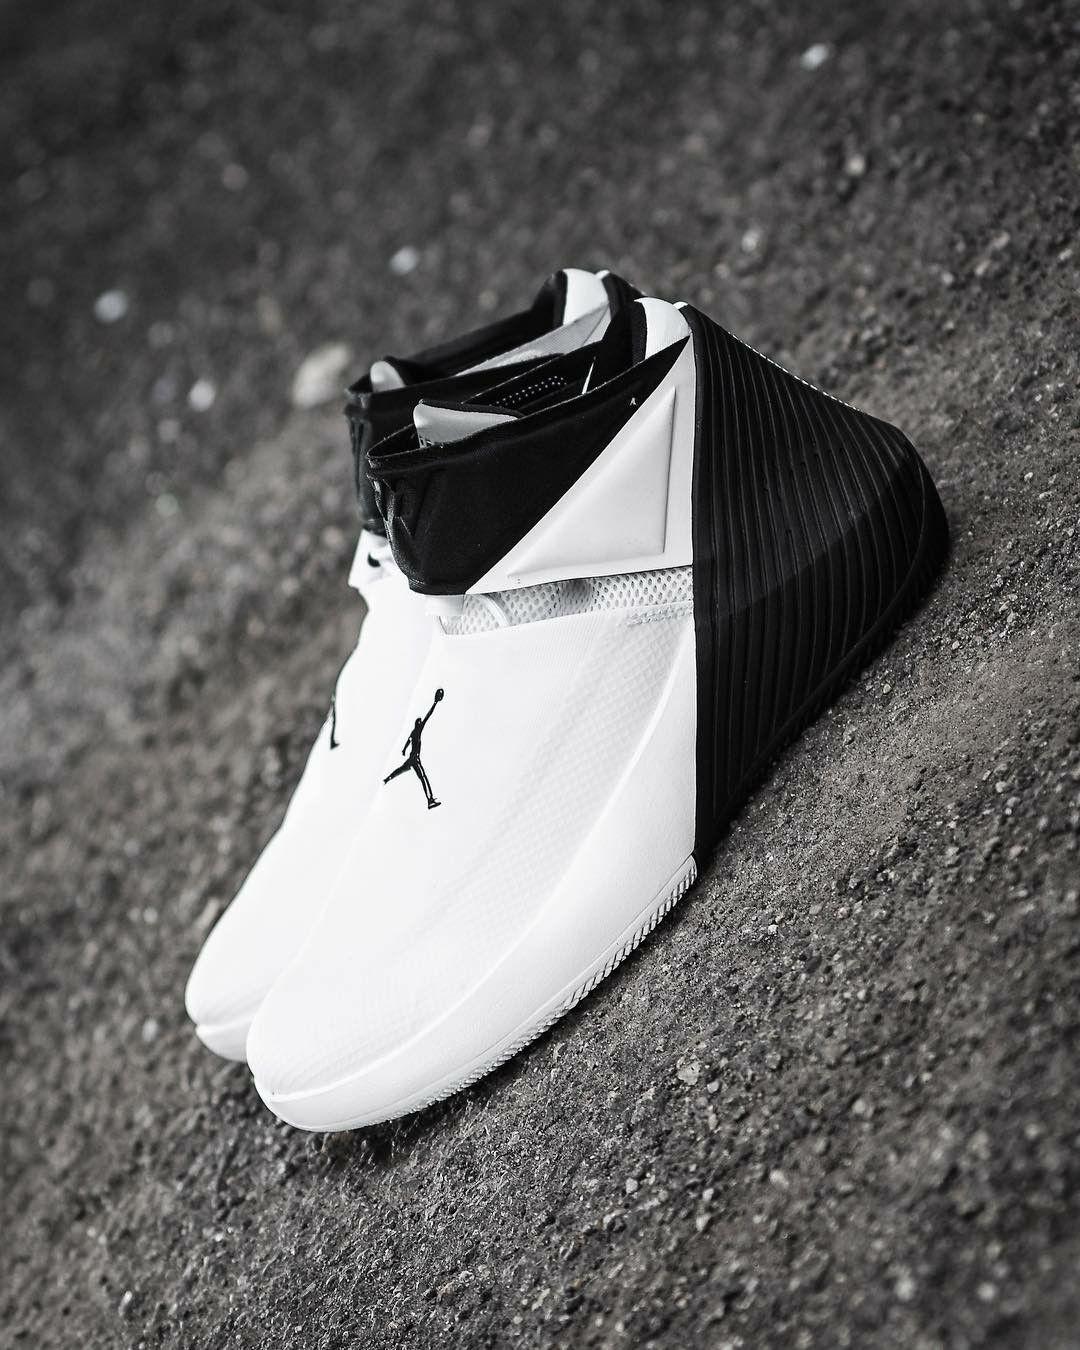 Jordan Why Not Zero 1 Black White Nice Shoes Sport Shoes Air